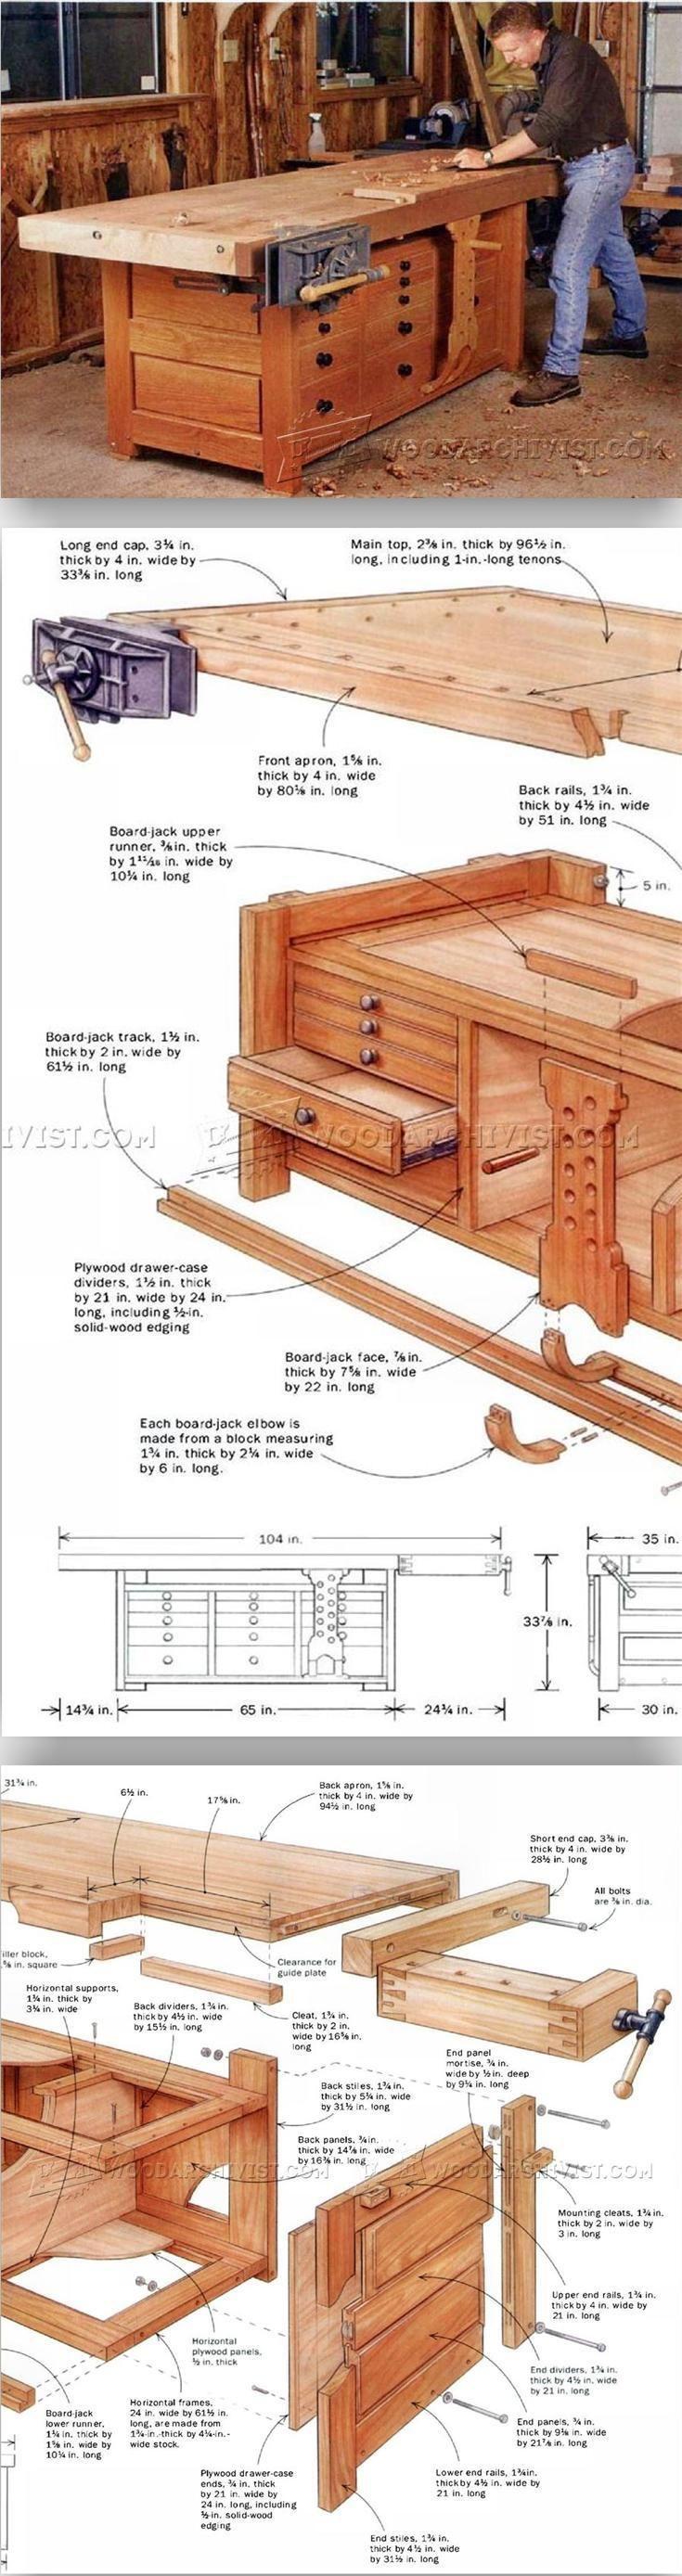 Rock-Solid Workbench Plans - Workshop Solutions Plans, Tips and Tricks   WoodArchivist.com